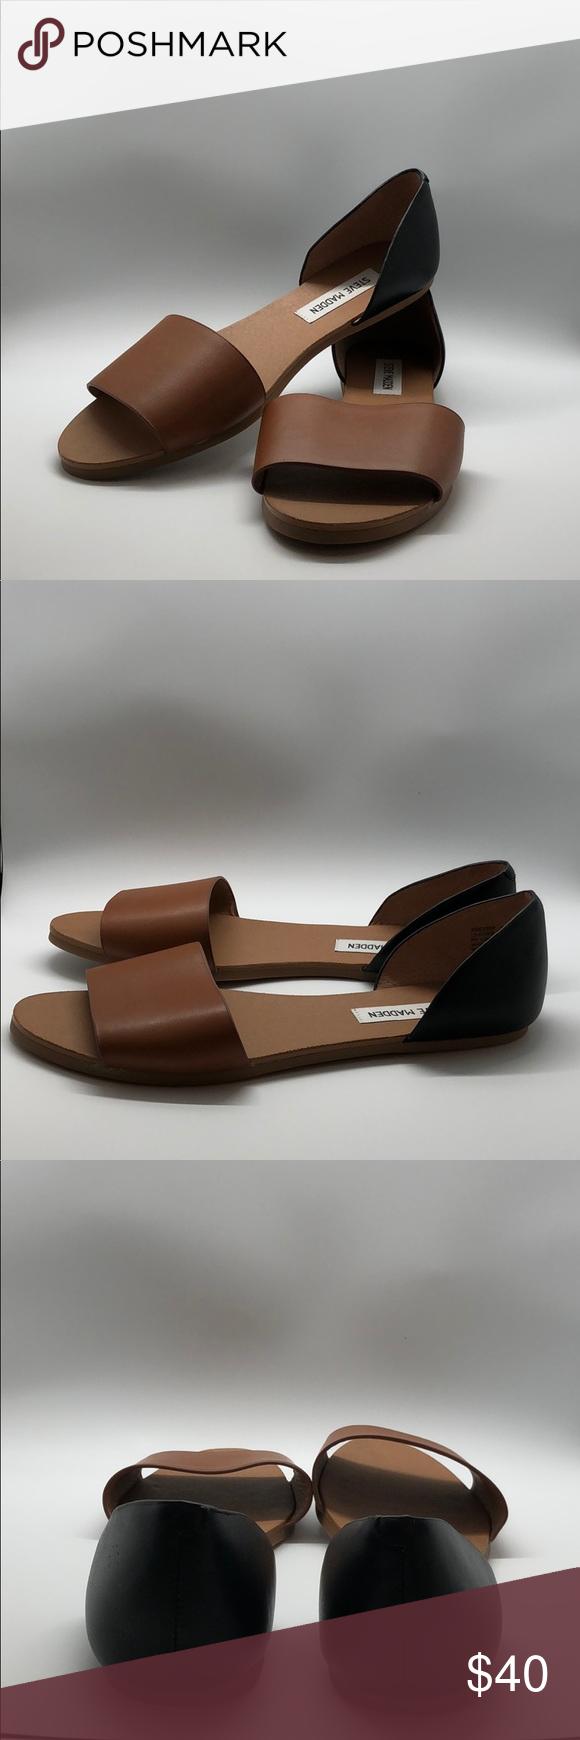 Steve Madden Sandals 9M Sidestep Banded Gorgeous EUC pair of